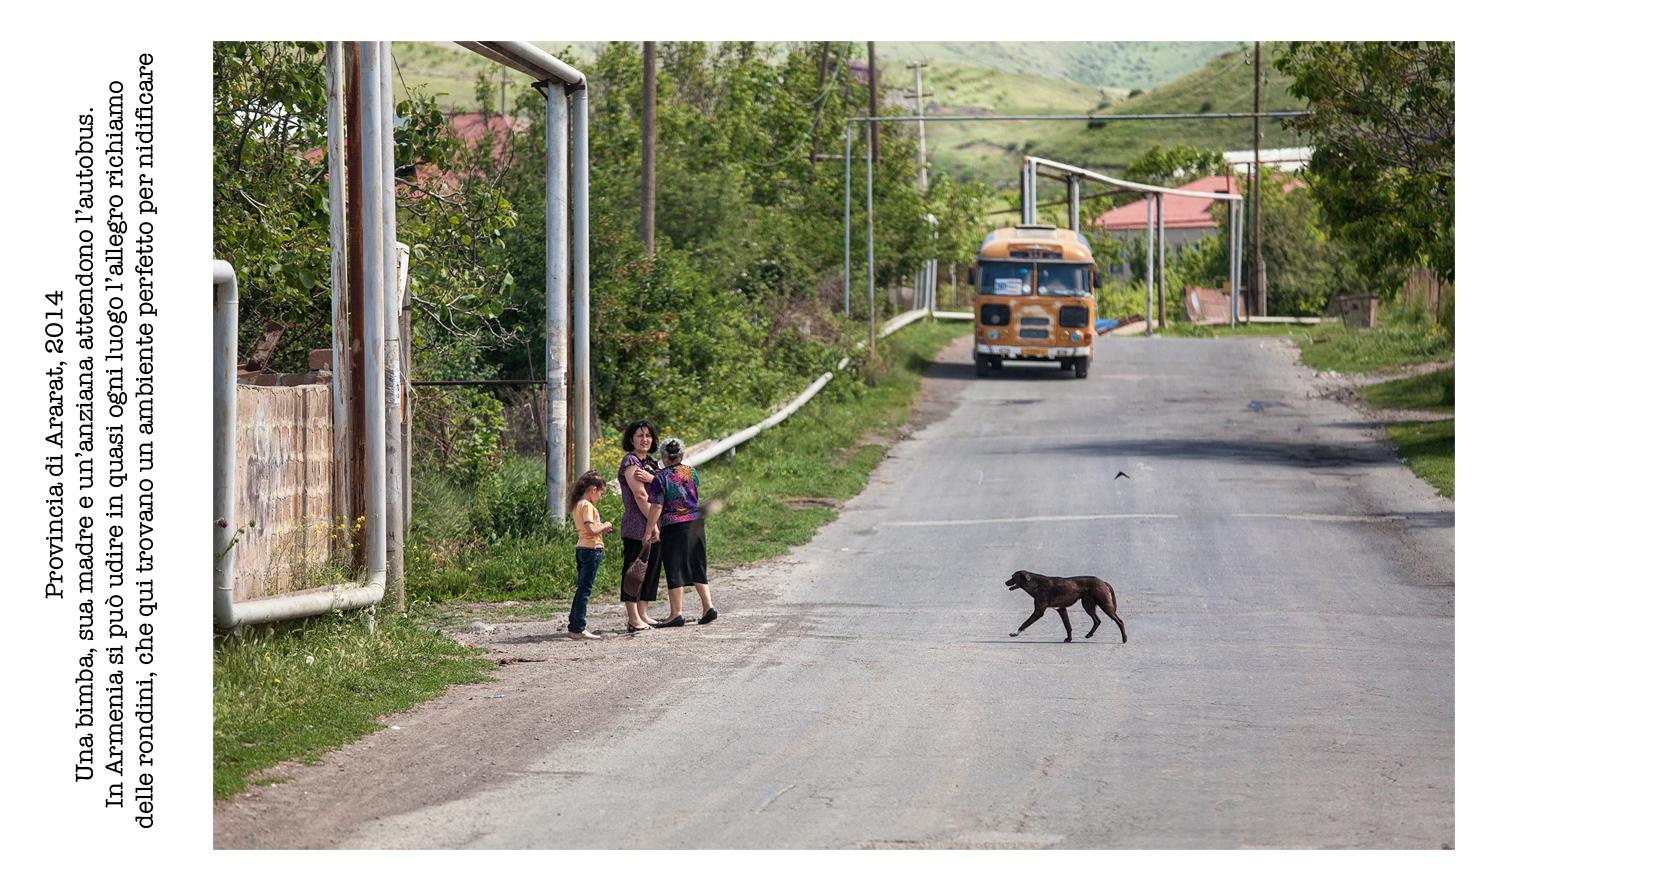 Viaggio-in-Armenia-19.jpg